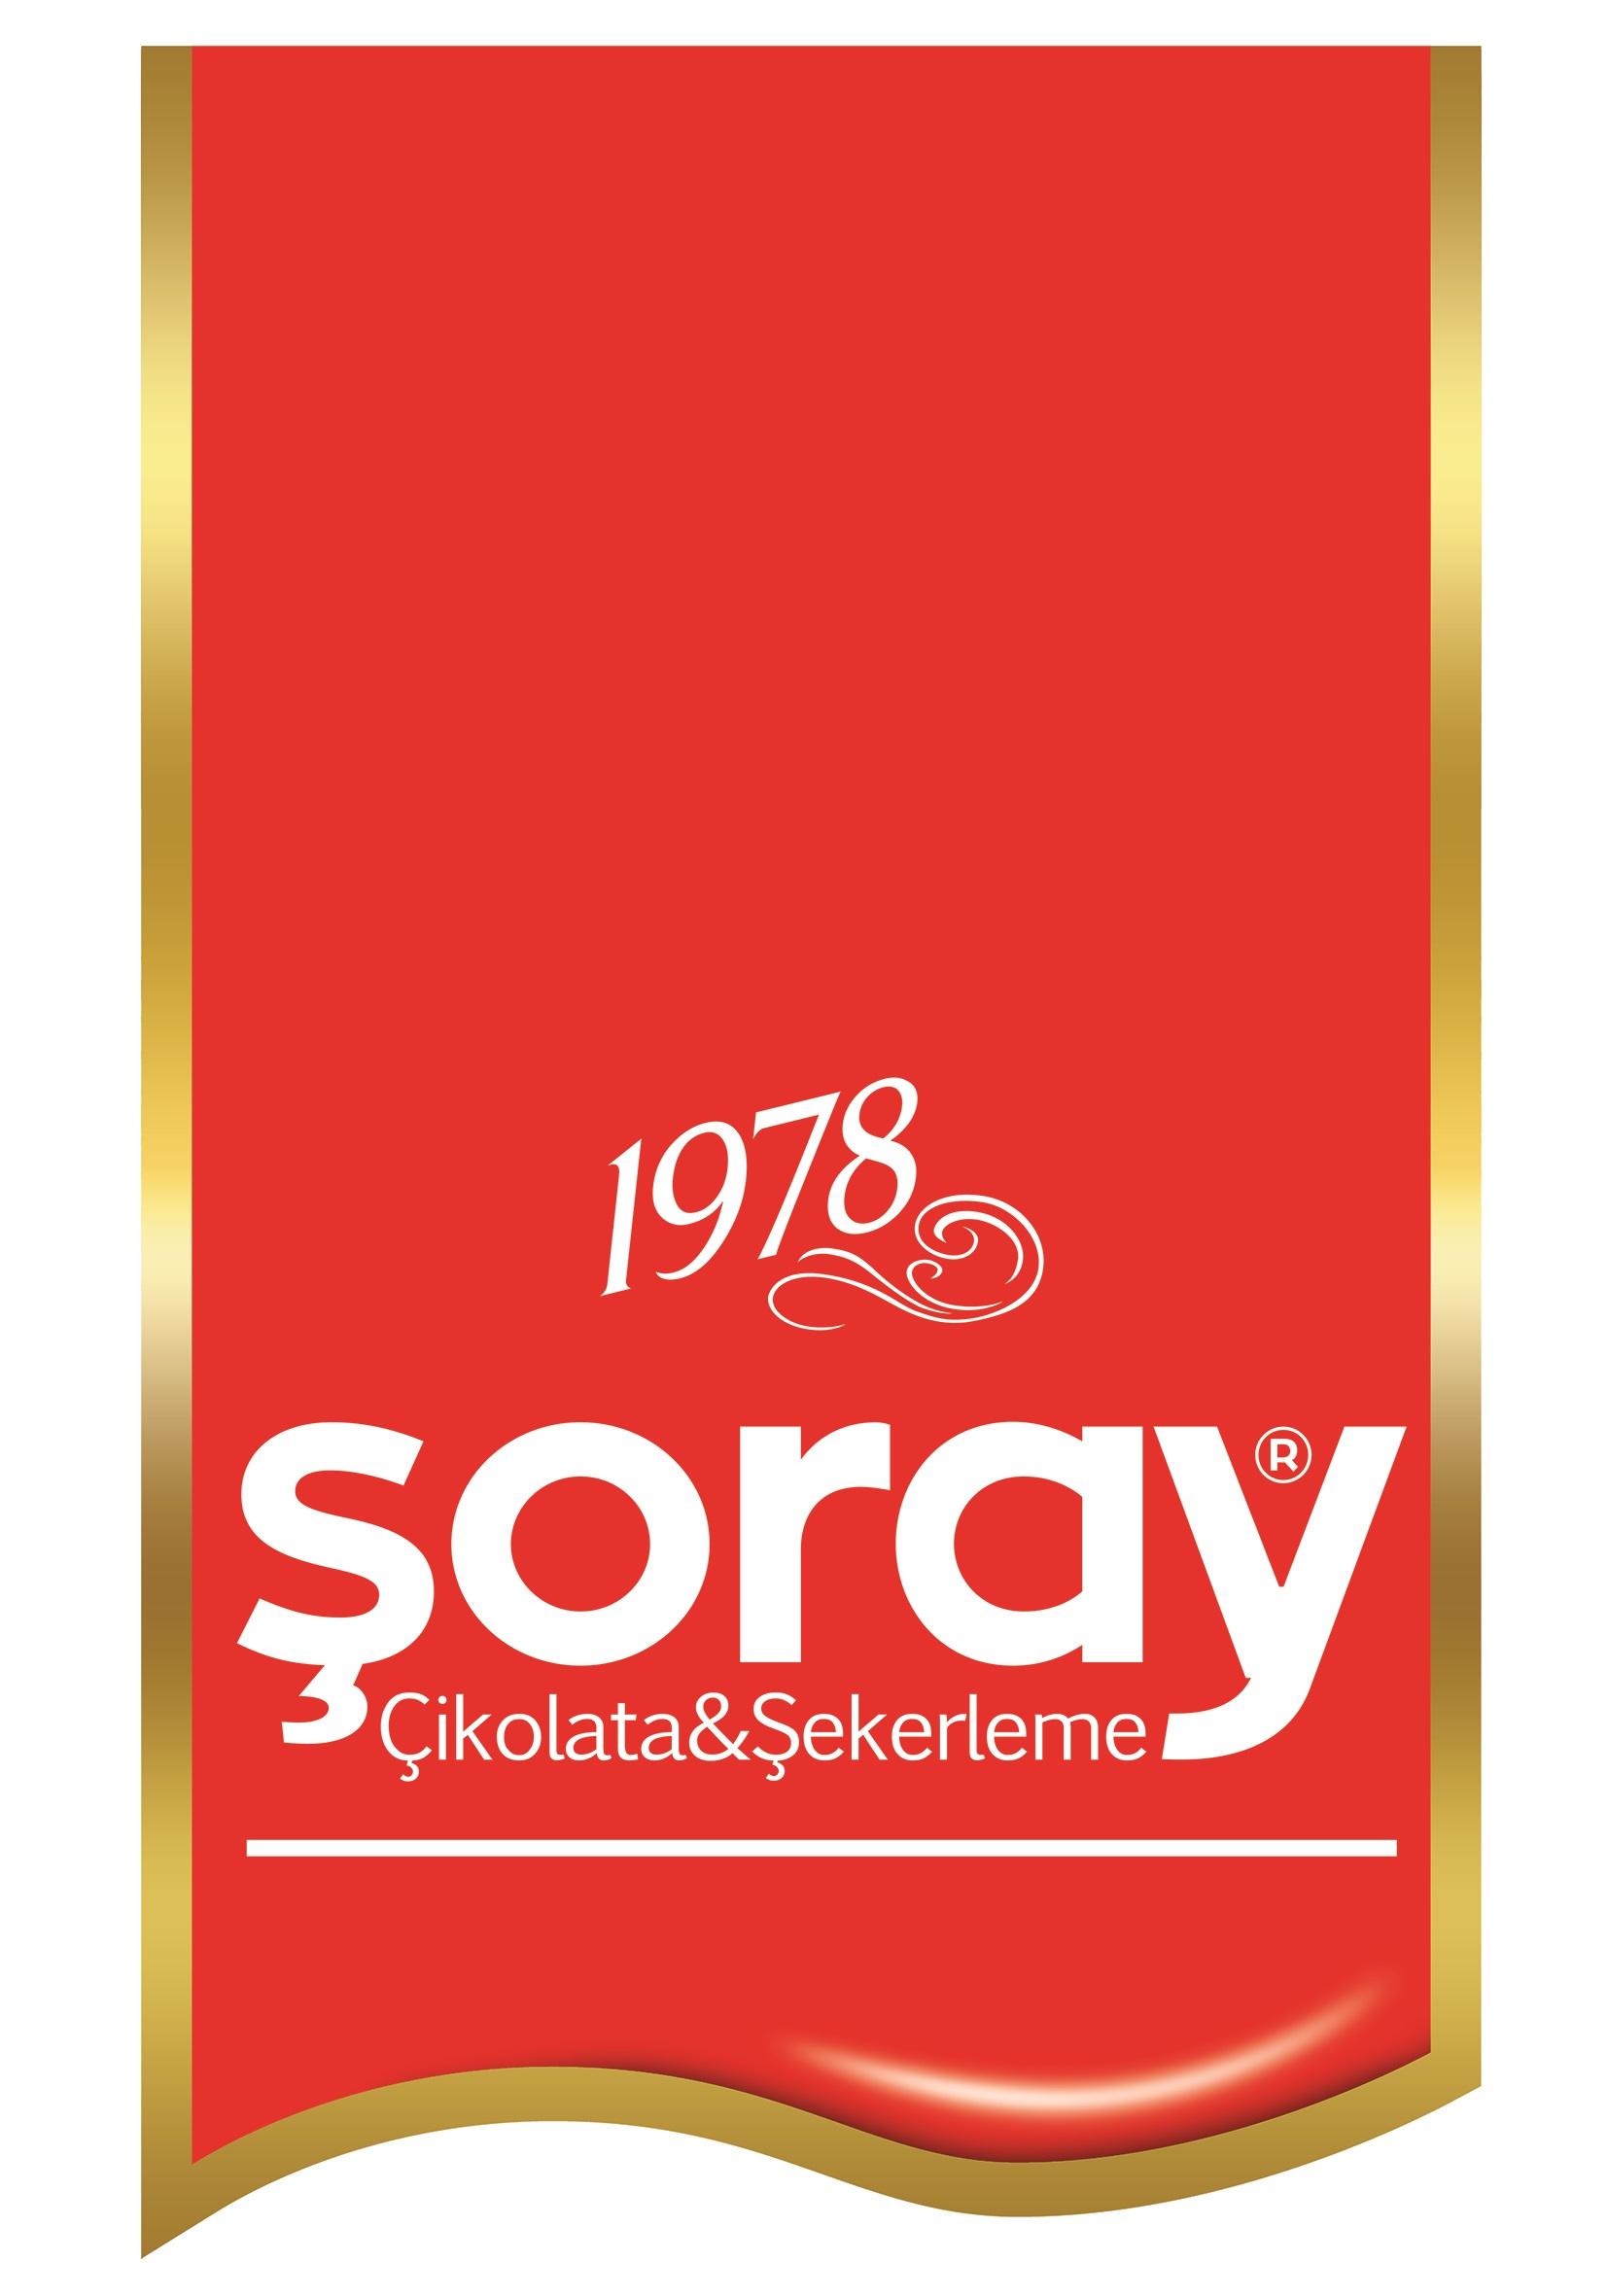 Soray Gida ic Ve Dis Ticaret Pazarlama Ltd Sti